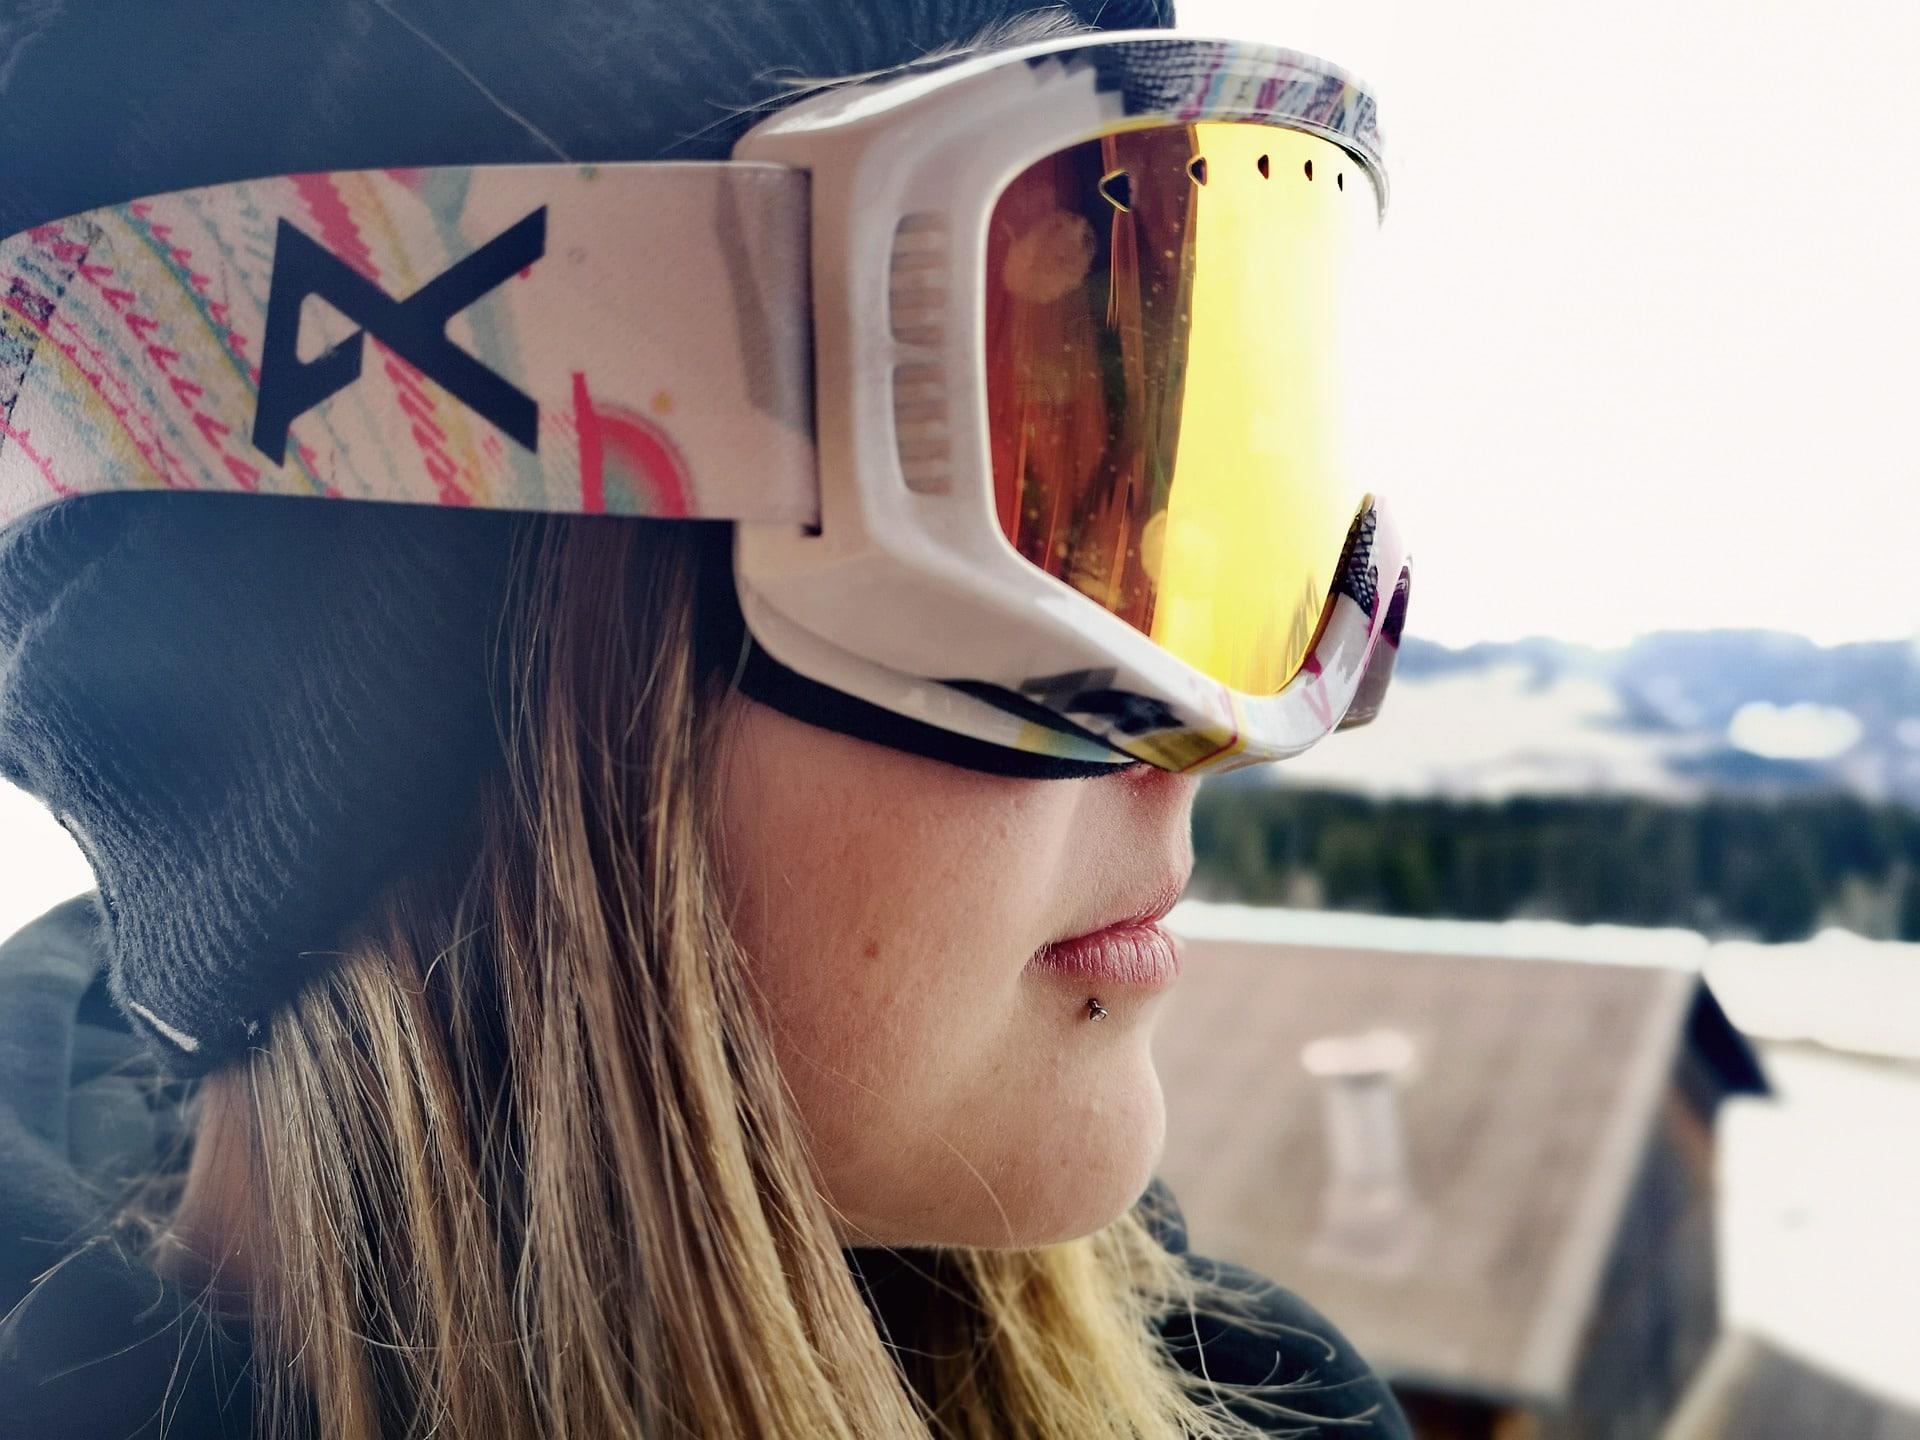 ski goggles gear pixabay